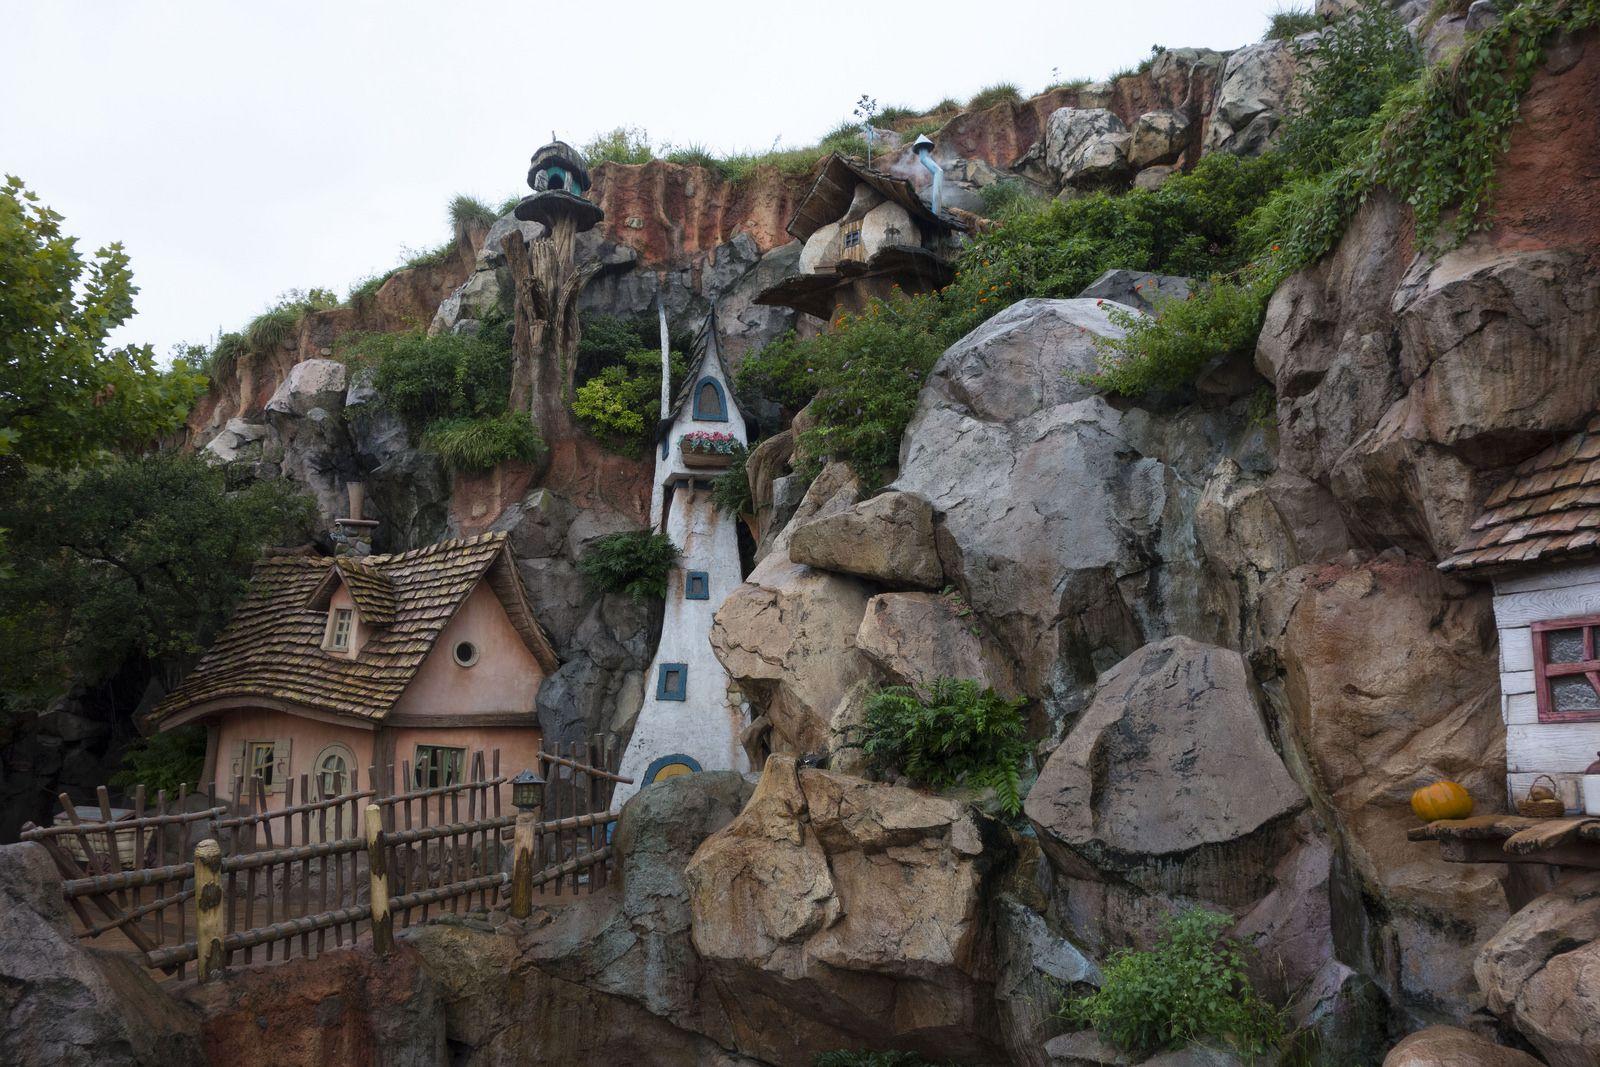 Tokyo Disneyland - Splash Mountain